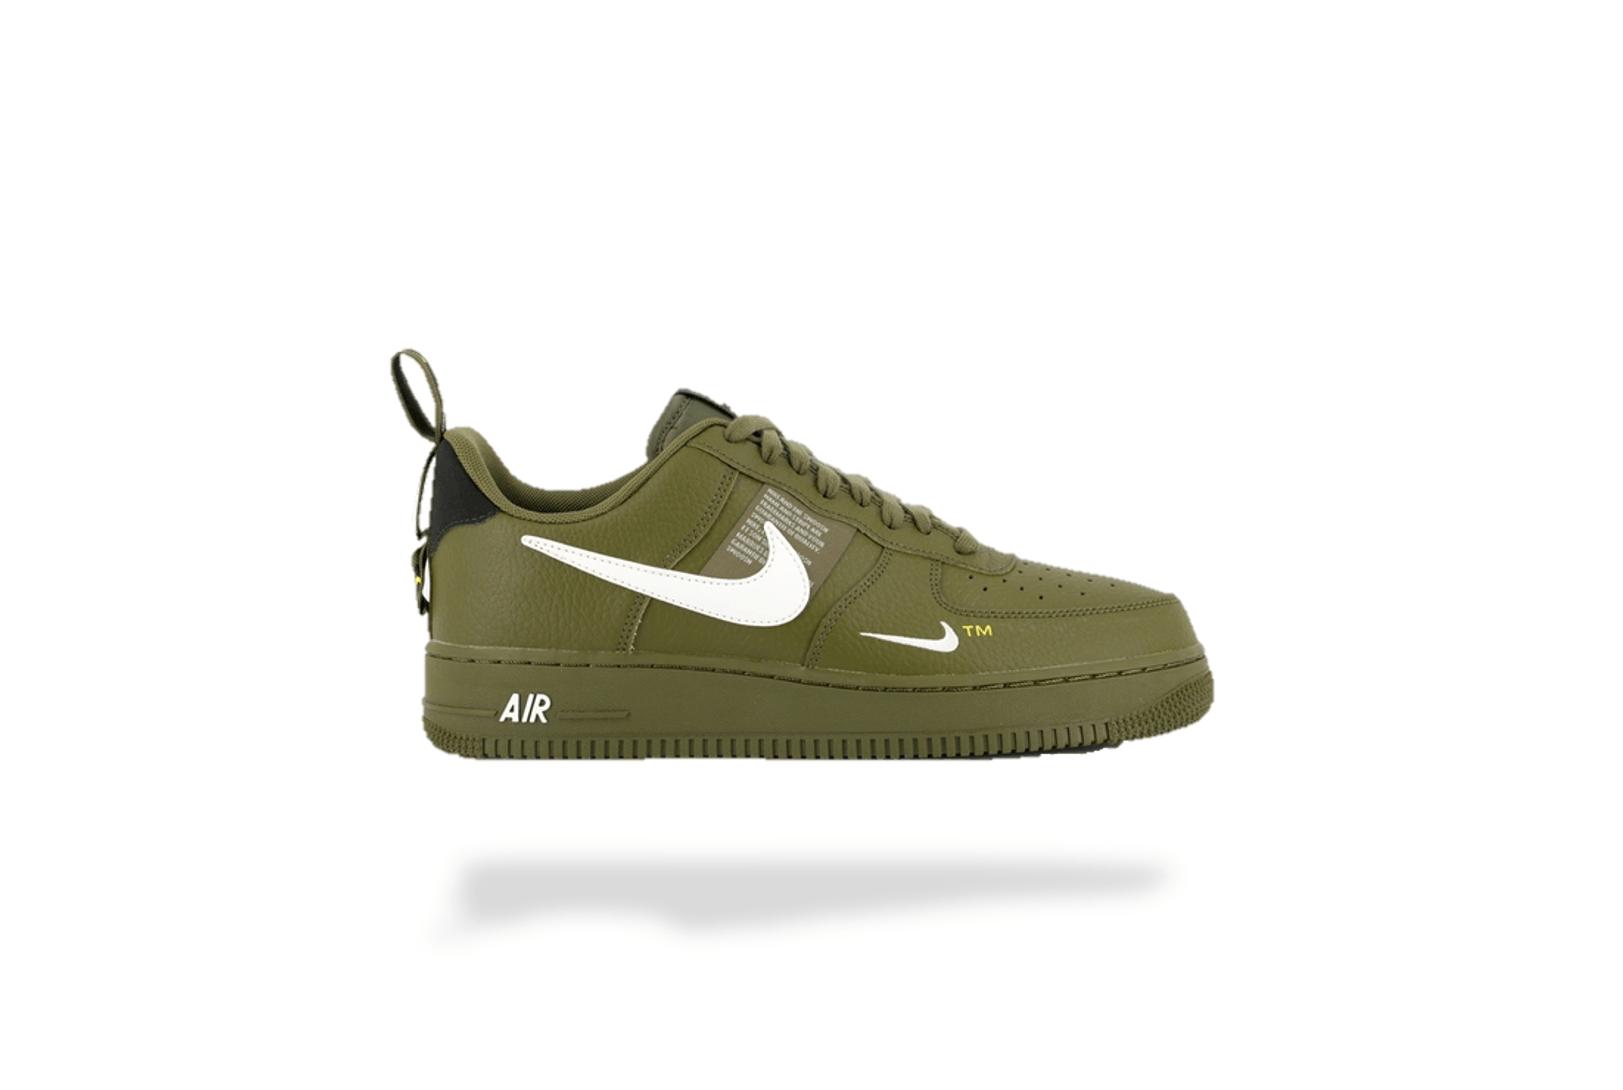 nike air force 1 kaki femme,Nike Air Force 1 Sage Low Kaki femme Chaussures Baskets femme